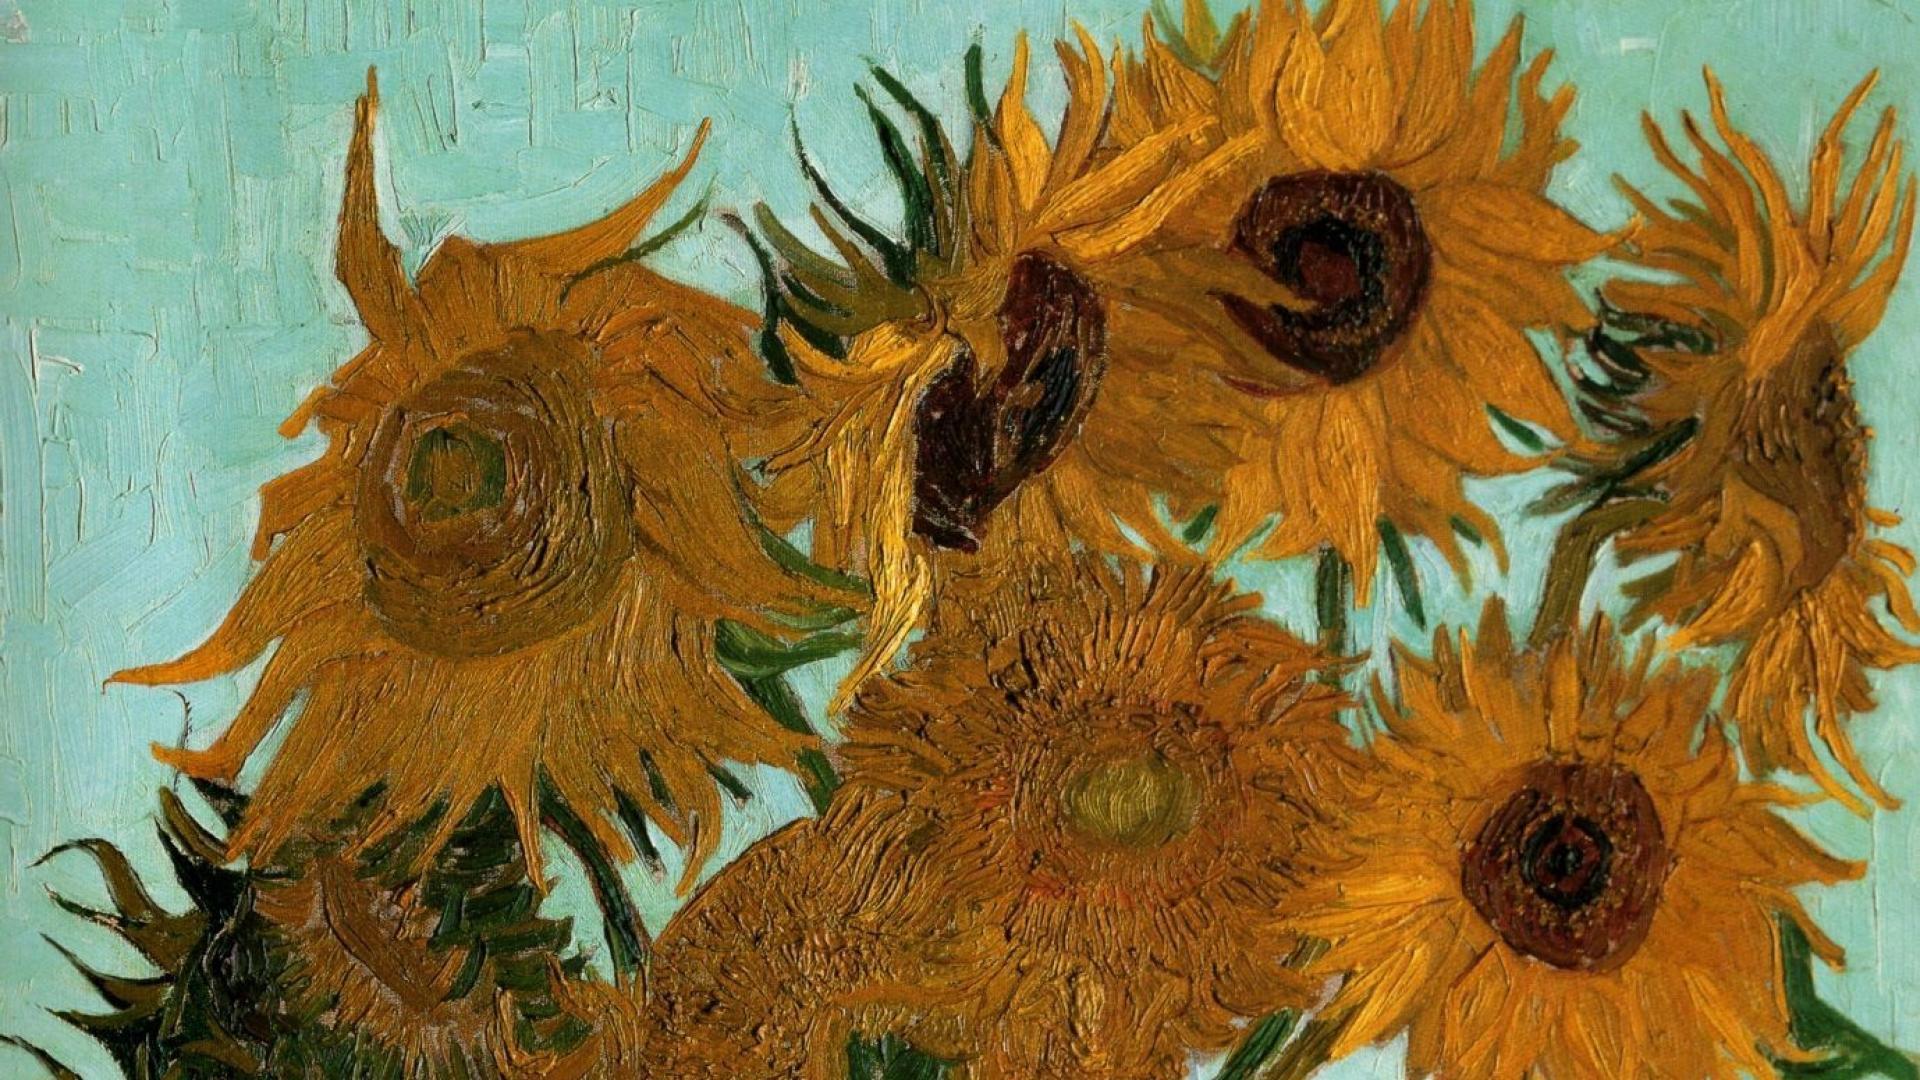 vincent van gogh vase with twelve sunflowers of 48 best free van gogh sunflower iphone wallpapers wallpaperaccess in 1920x1080 paintings vincent van gogh sunflowers vases still life wallpaper download a· 736x1104